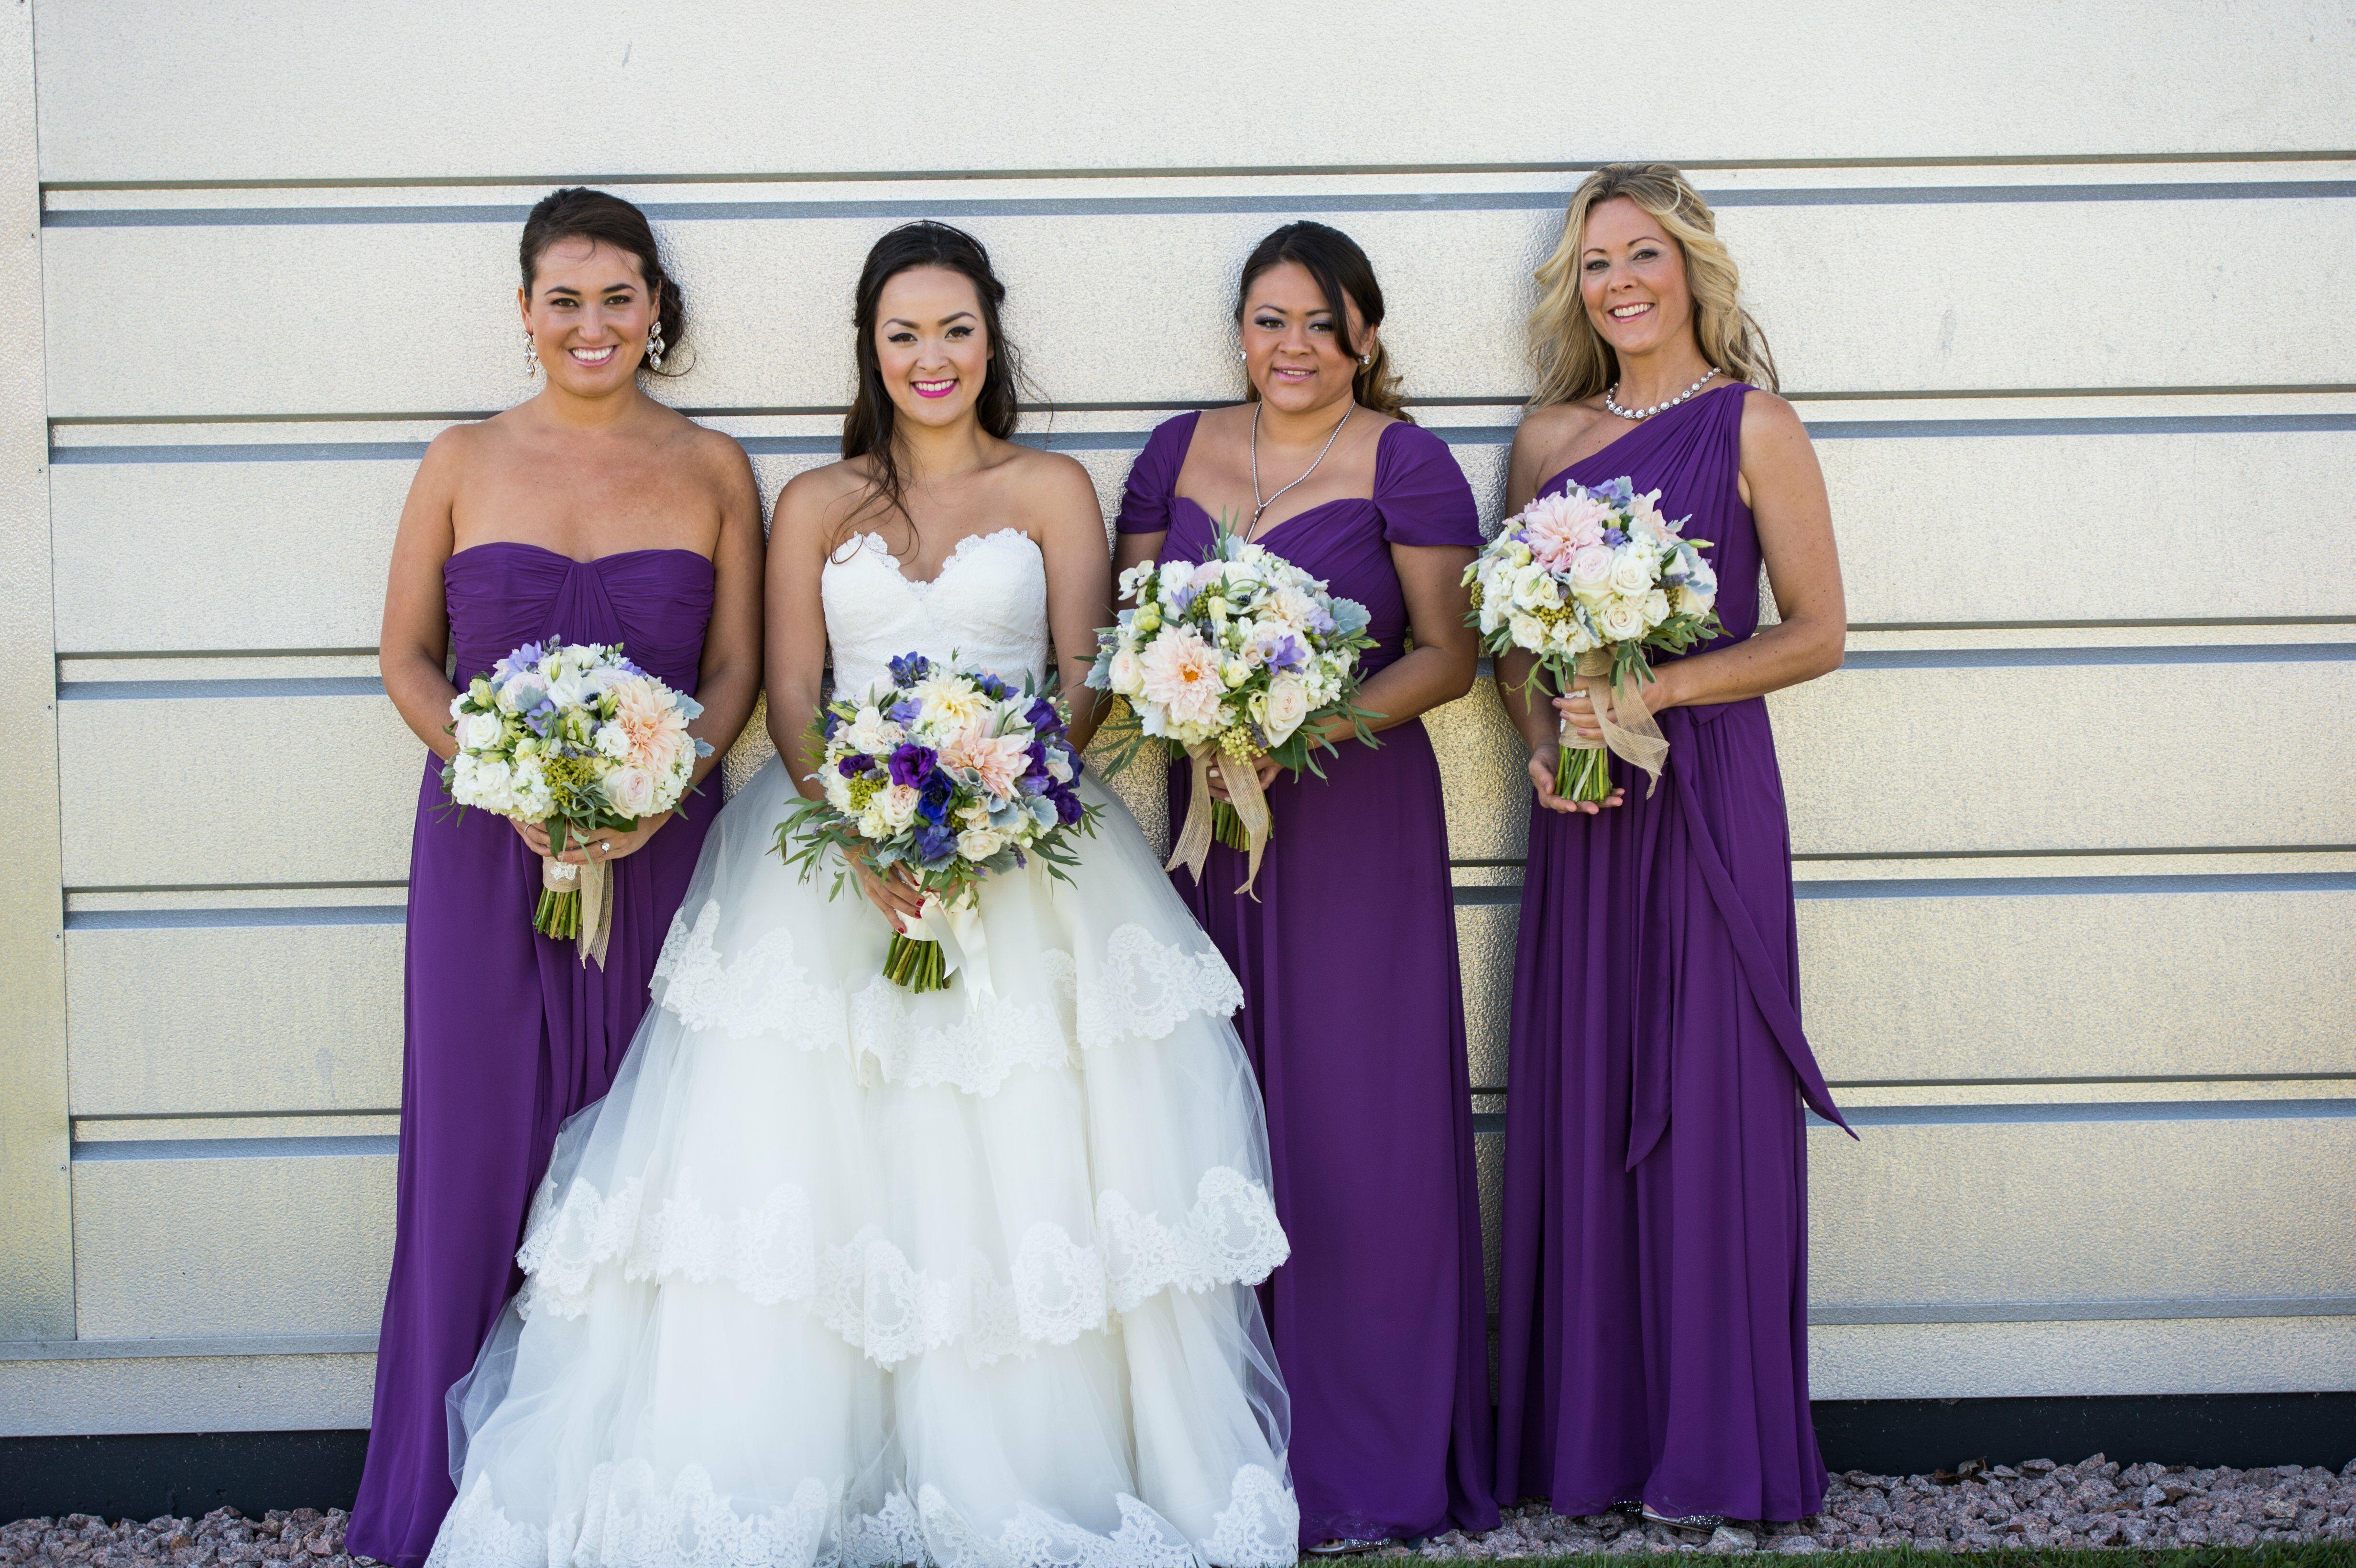 Lapis Colored Bridesmaid Dresses - Wedding Dress Ideas